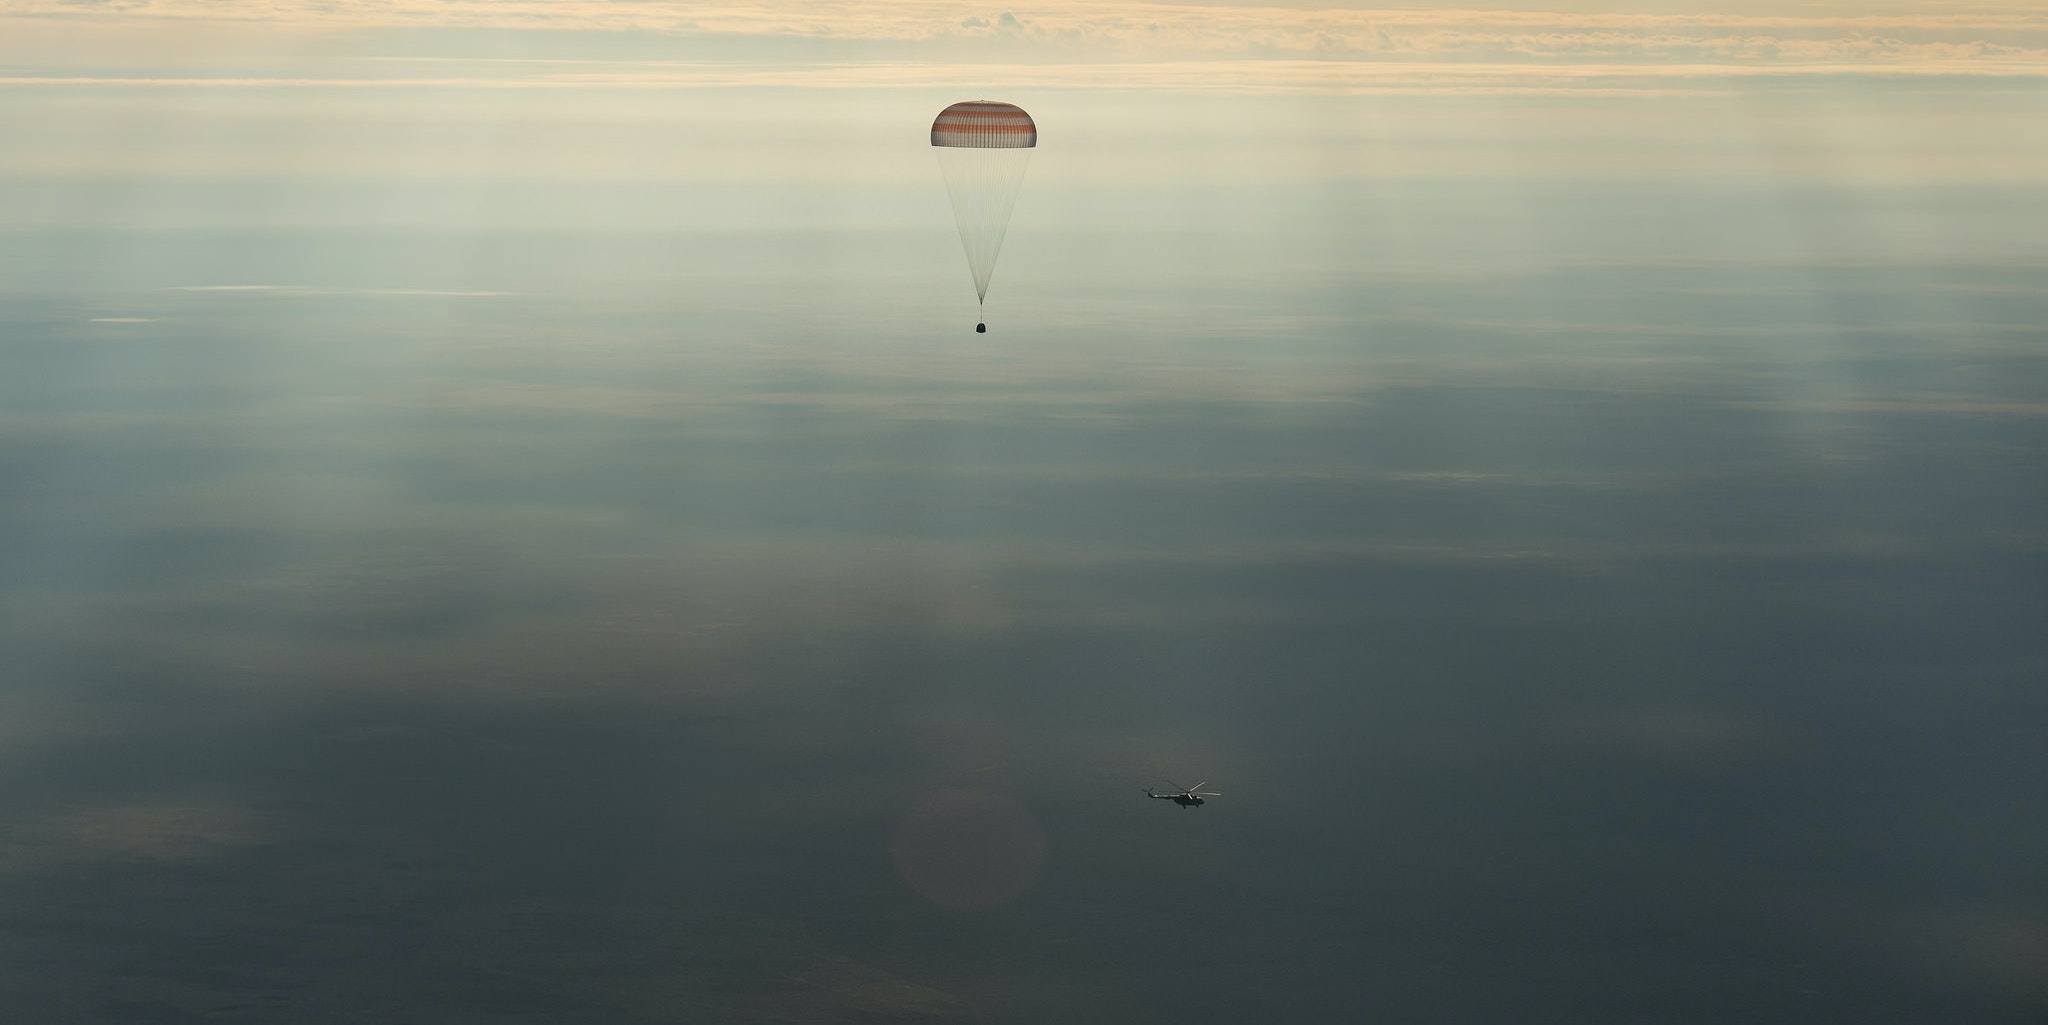 Kate Rubins, Takuya Onishi, and Anatoly Ivanishin safely return to Earth.